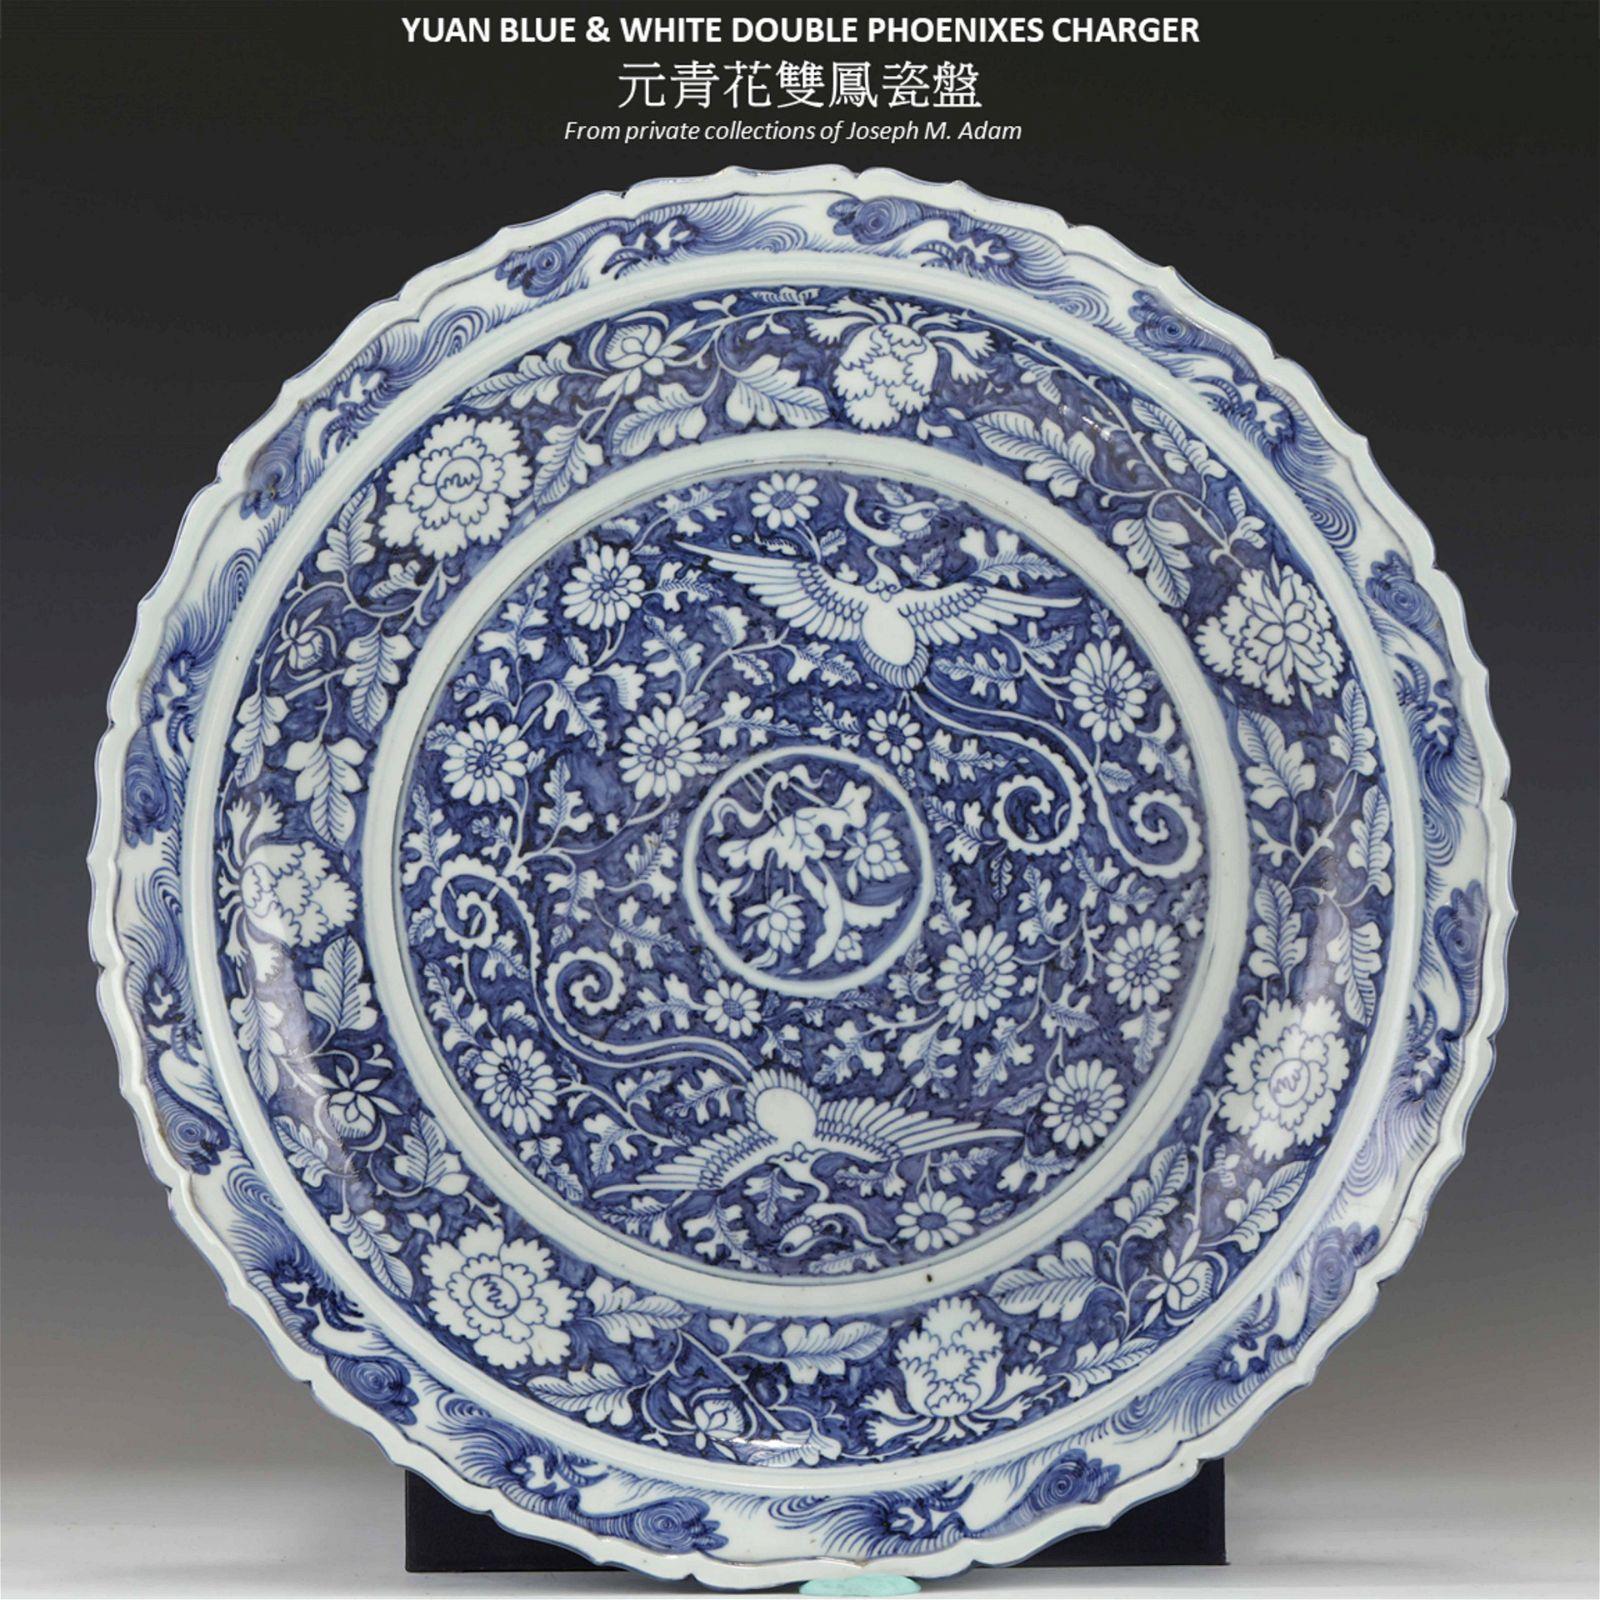 YUAN BLUE & WHITE DOUBLE PHOENIXES CHARGER